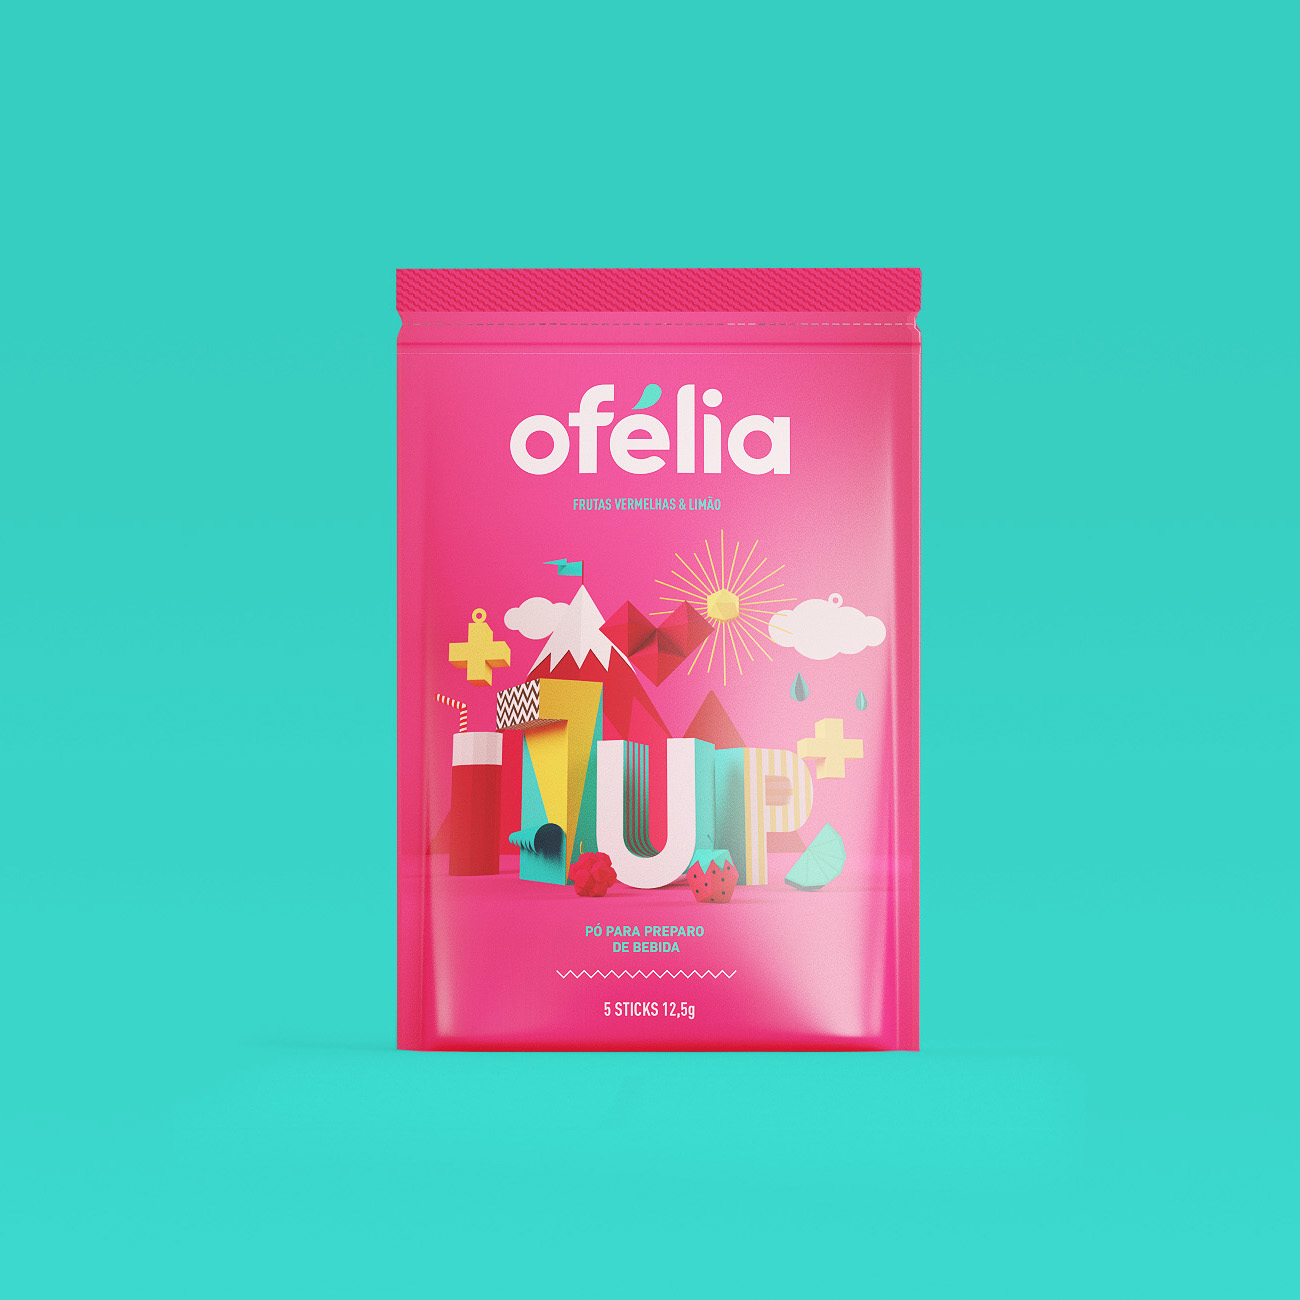 tb_ofelia